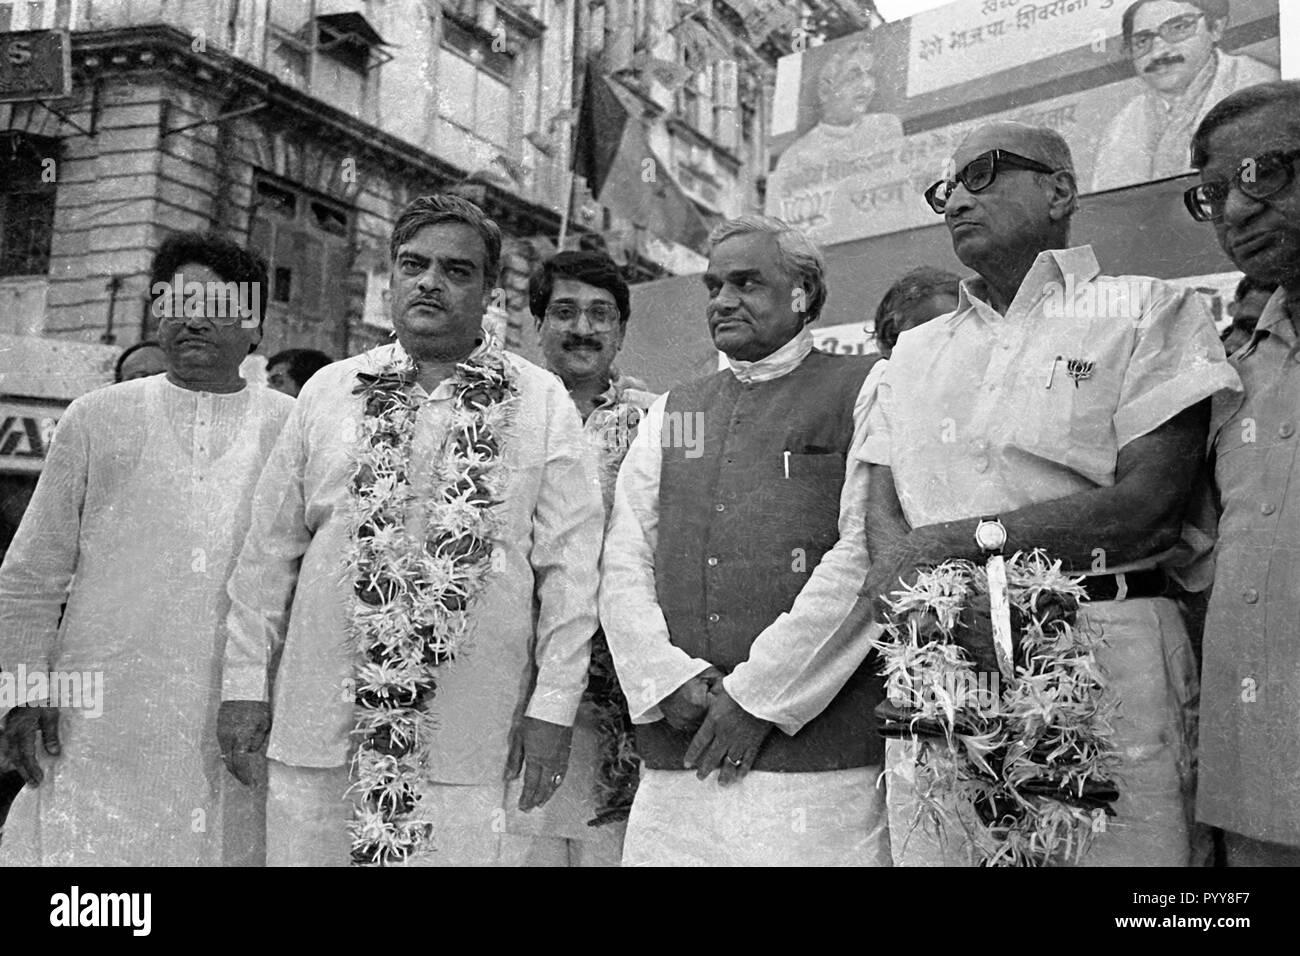 Former Prime Minister of India Atal Bihari Vajpayee, Mumbai, Maharashtra, India, Asia, 1900s - Stock Image